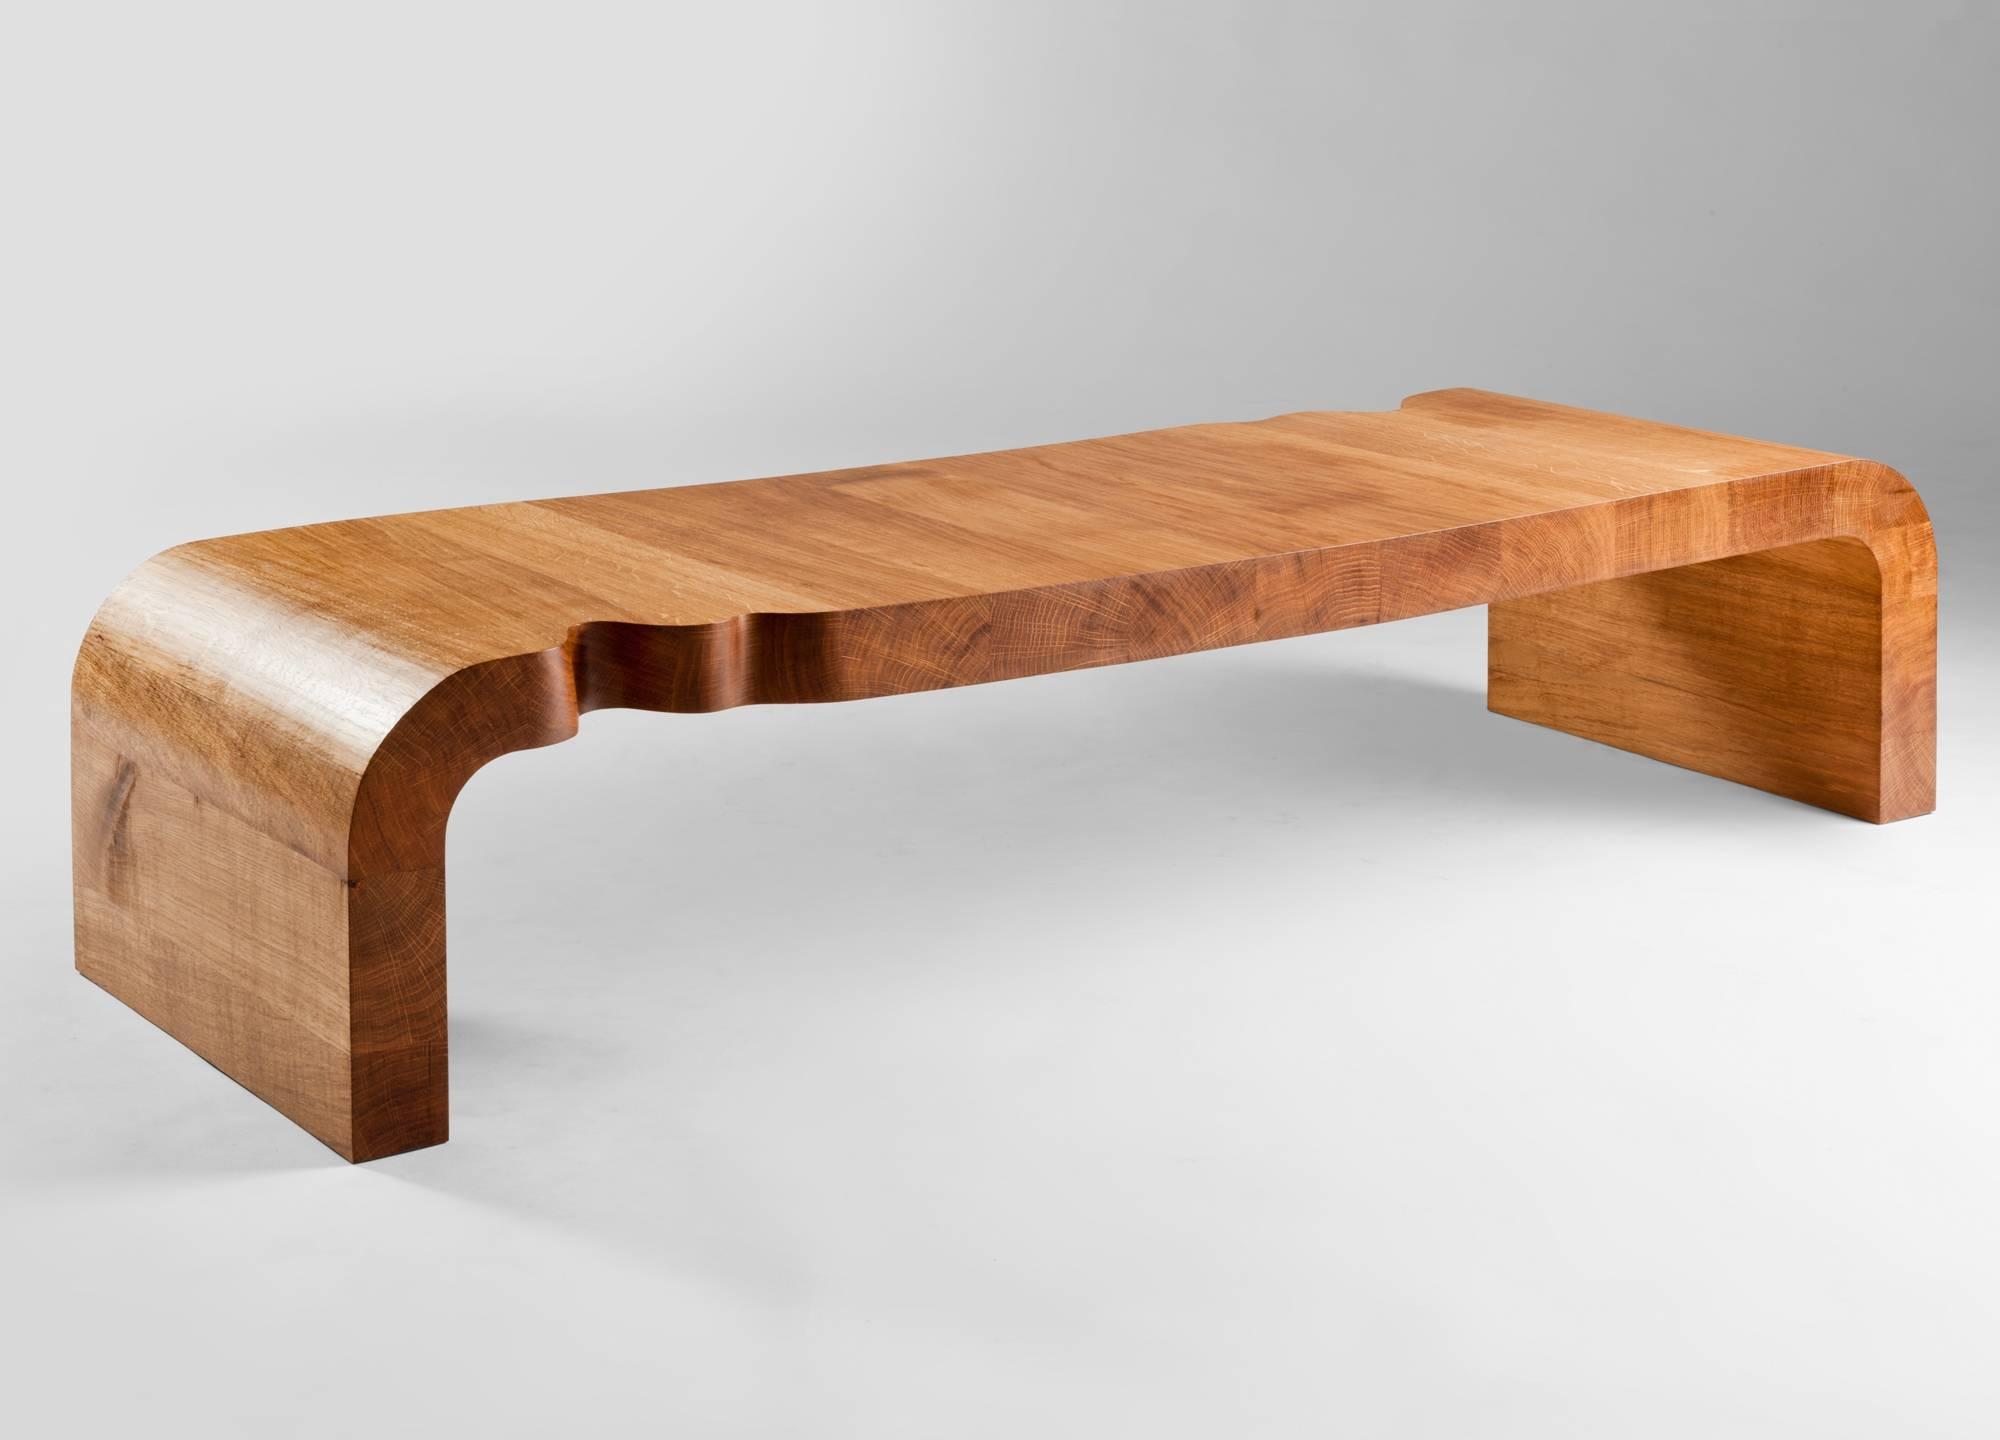 Conceptual Designer Coffee Table - Fine Furniture Maker regarding Bespoke Coffee Tables (Image 18 of 30)